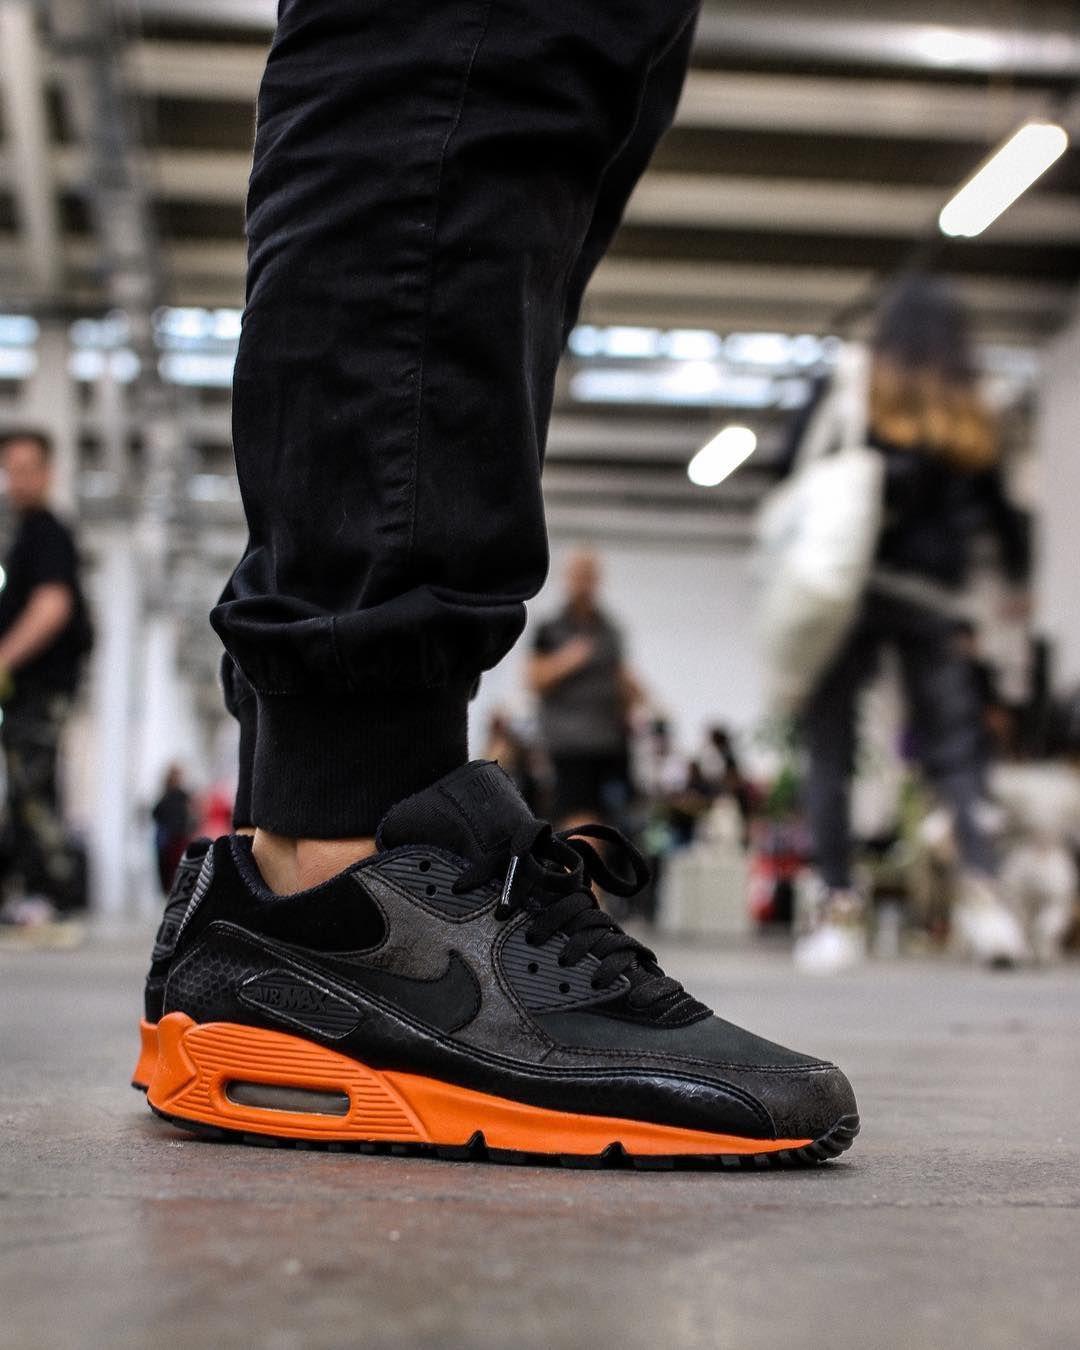 3419d6ec0d5e3 Nike Air Max 90  Nike  AirMax  AirMax90  Sneakers  SneakerHead ...